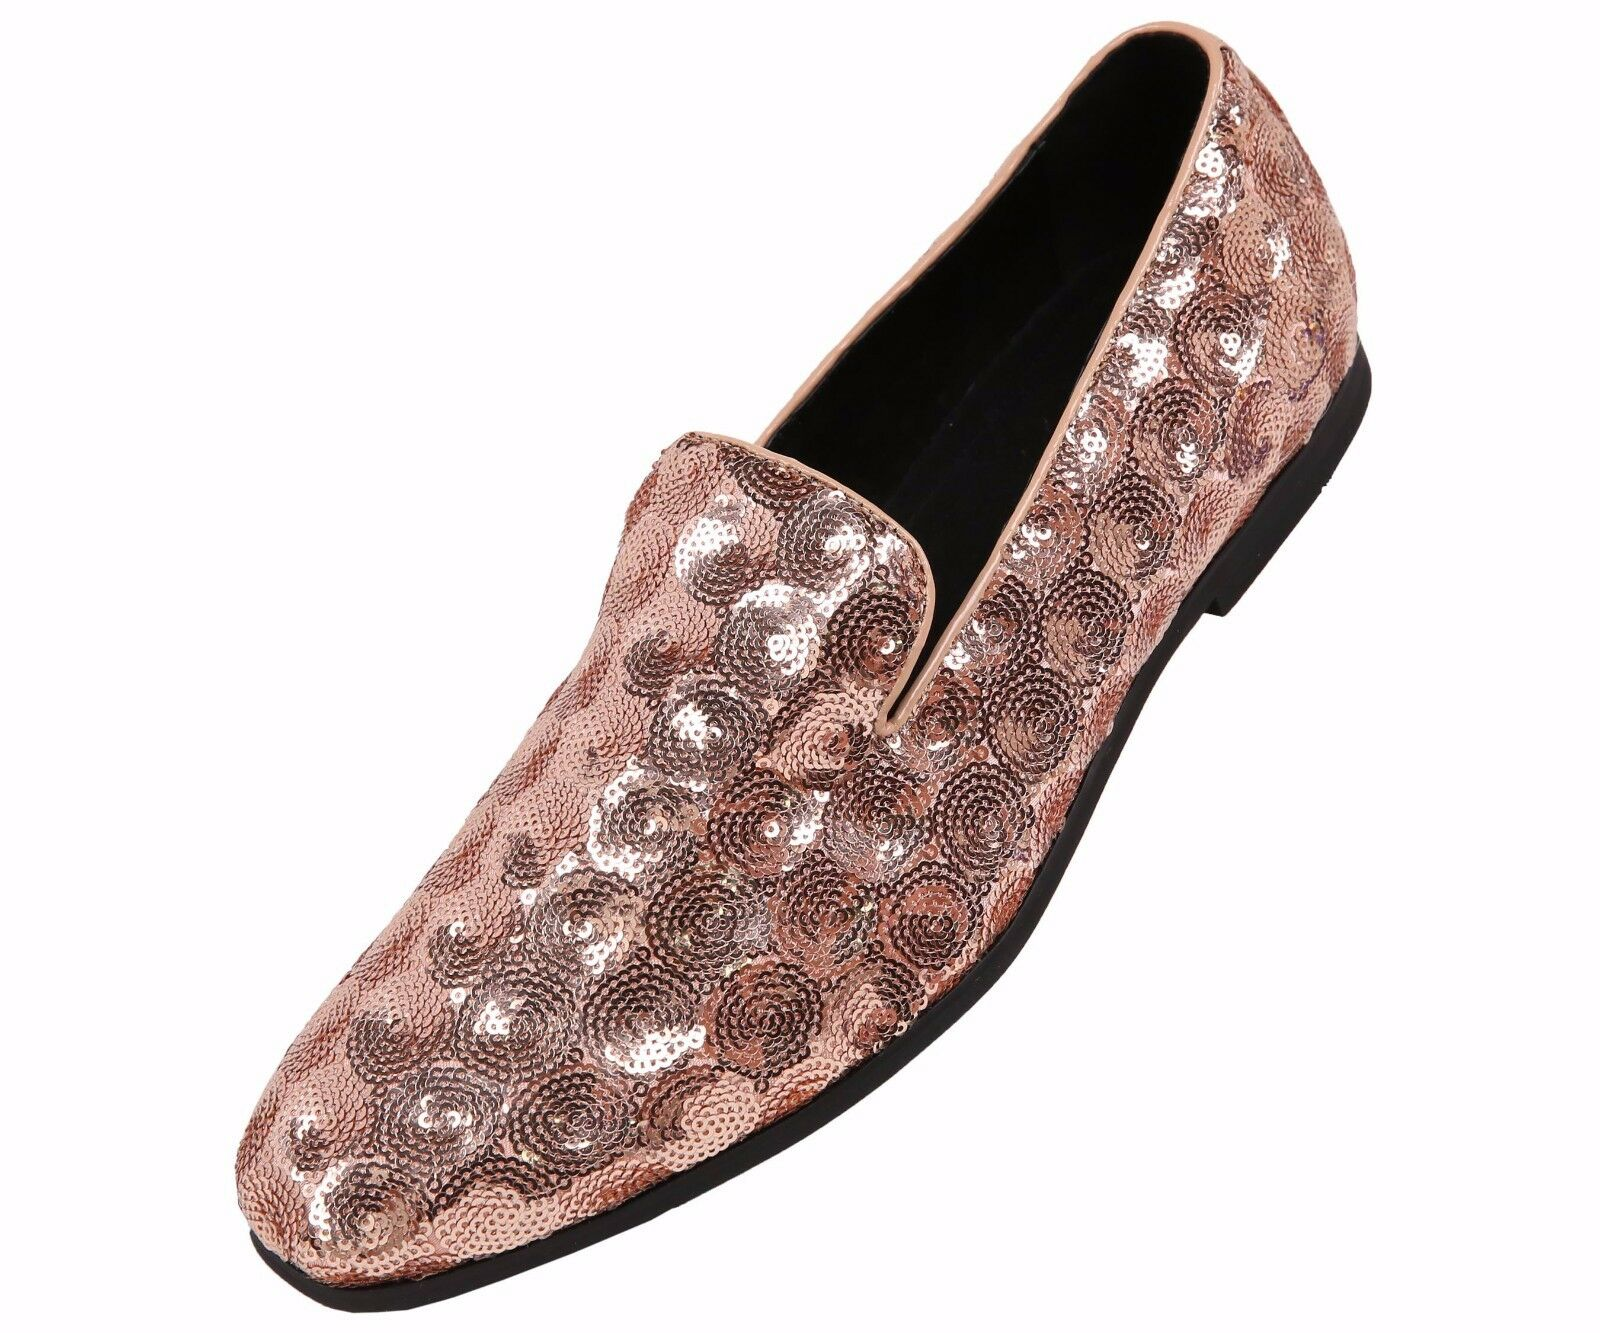 7565779f840e Amali Mens Rose Gold Sequin Circle Patterned Dress Shoe Loafer   Swirl-010